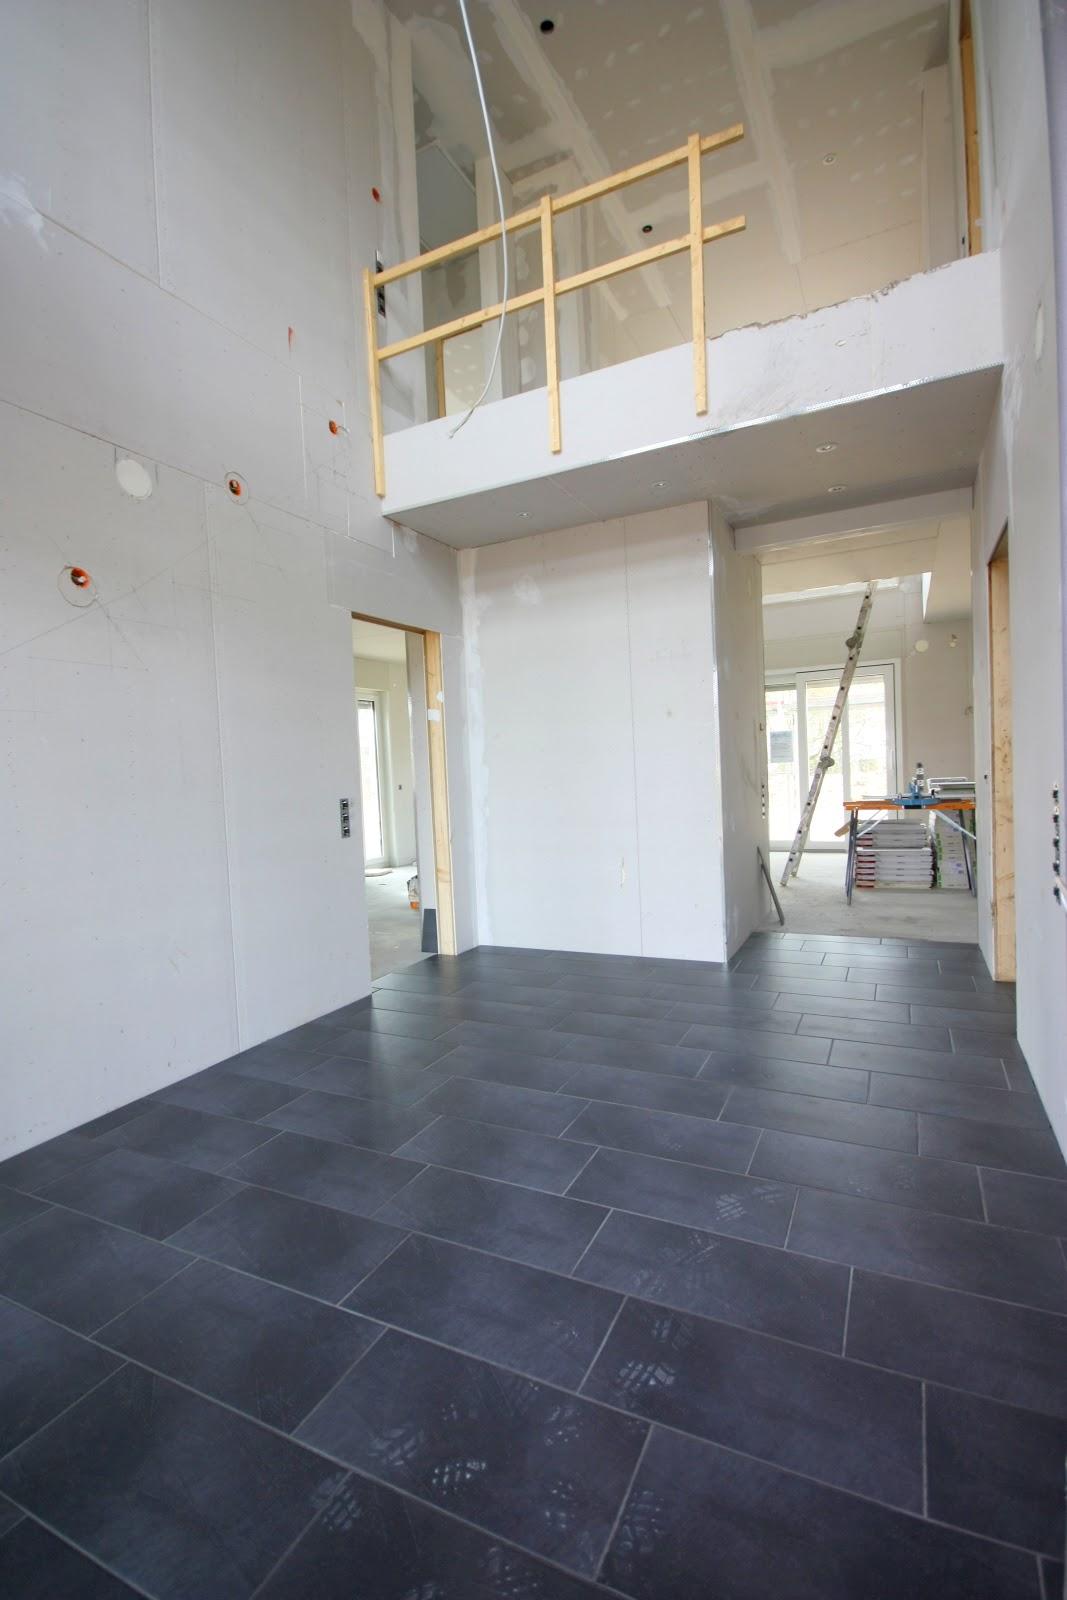 chris marios hausblog kamin und fliesen. Black Bedroom Furniture Sets. Home Design Ideas